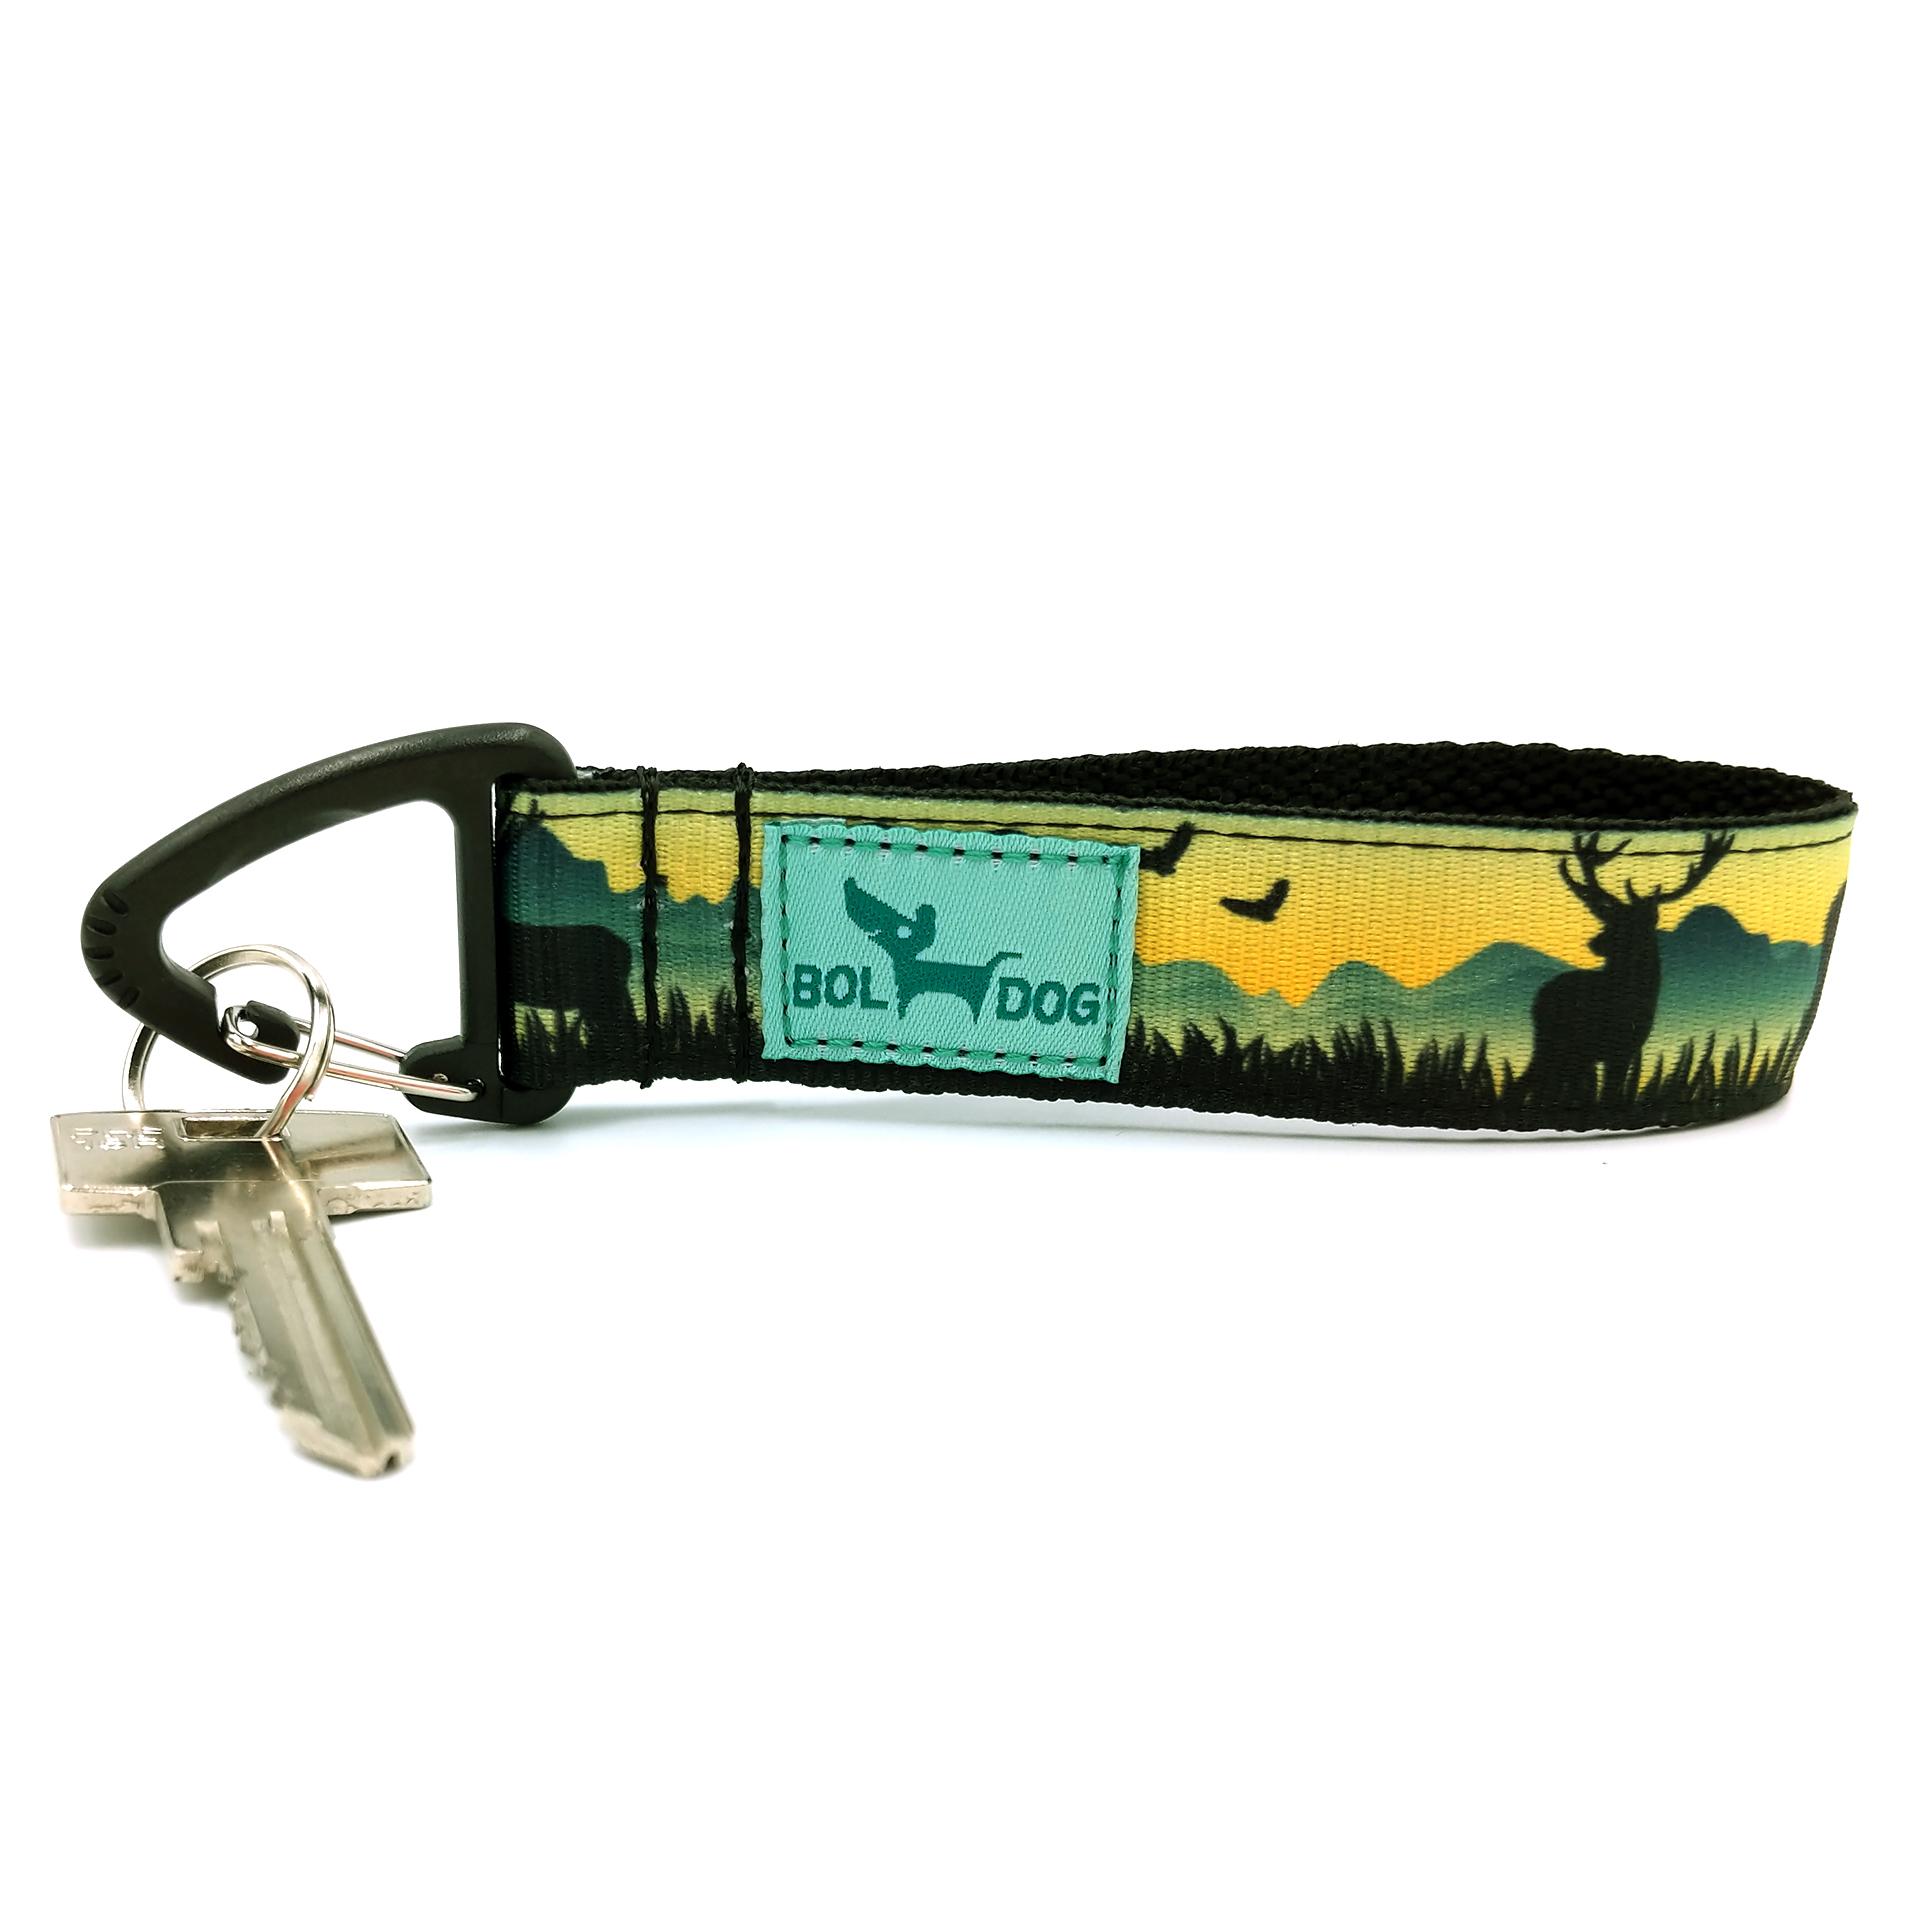 Hunter key holder